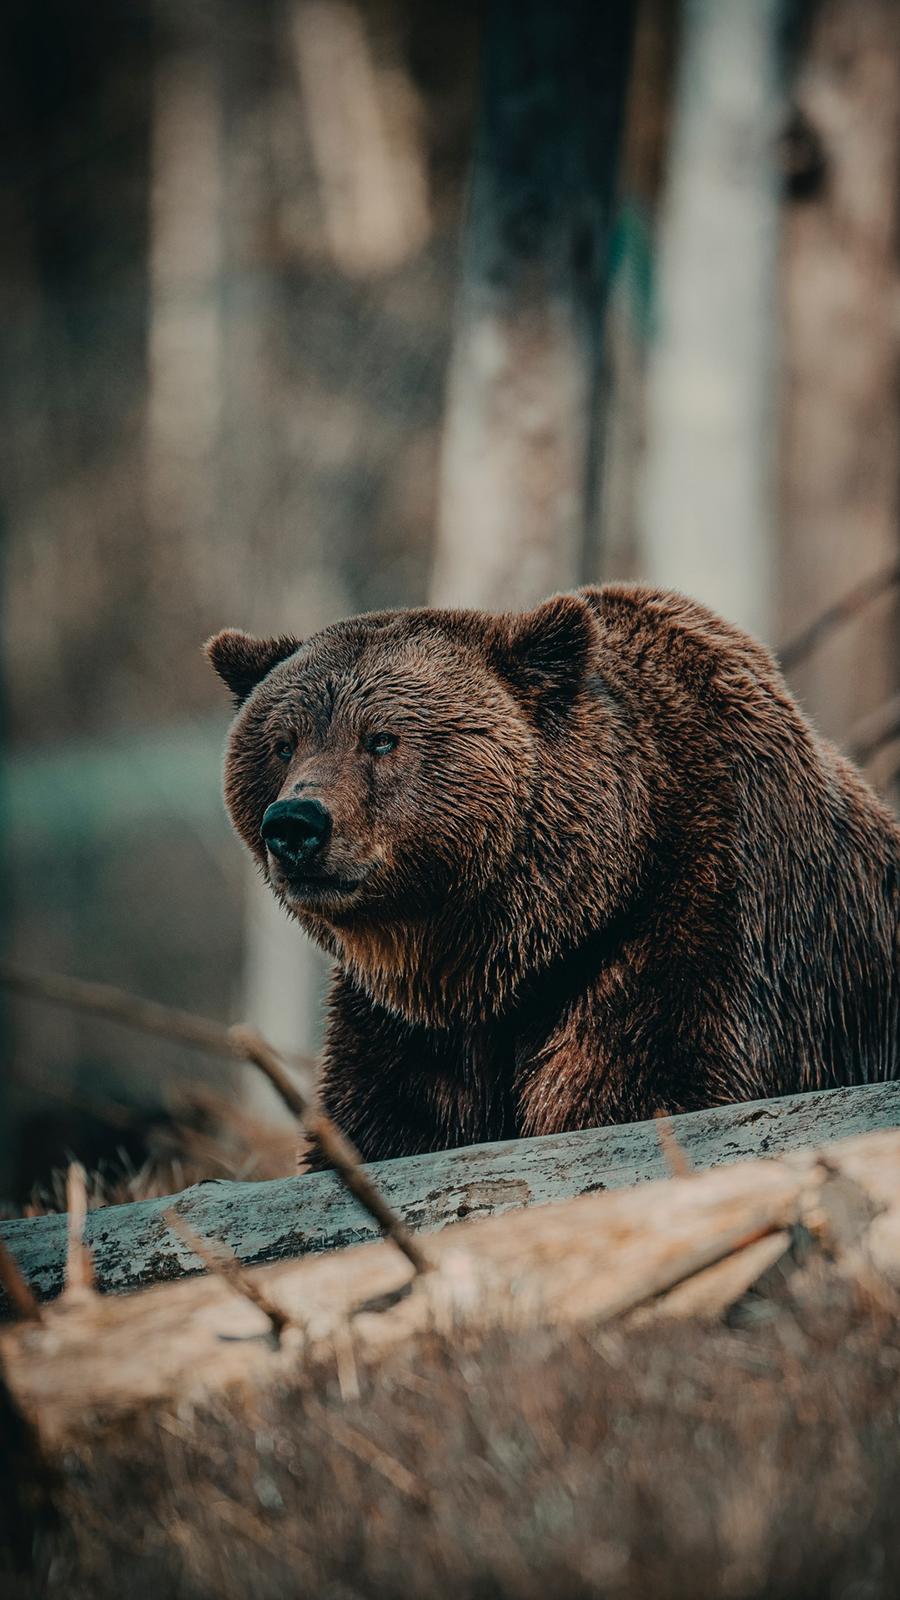 Bear HD Wallpapers Free Download